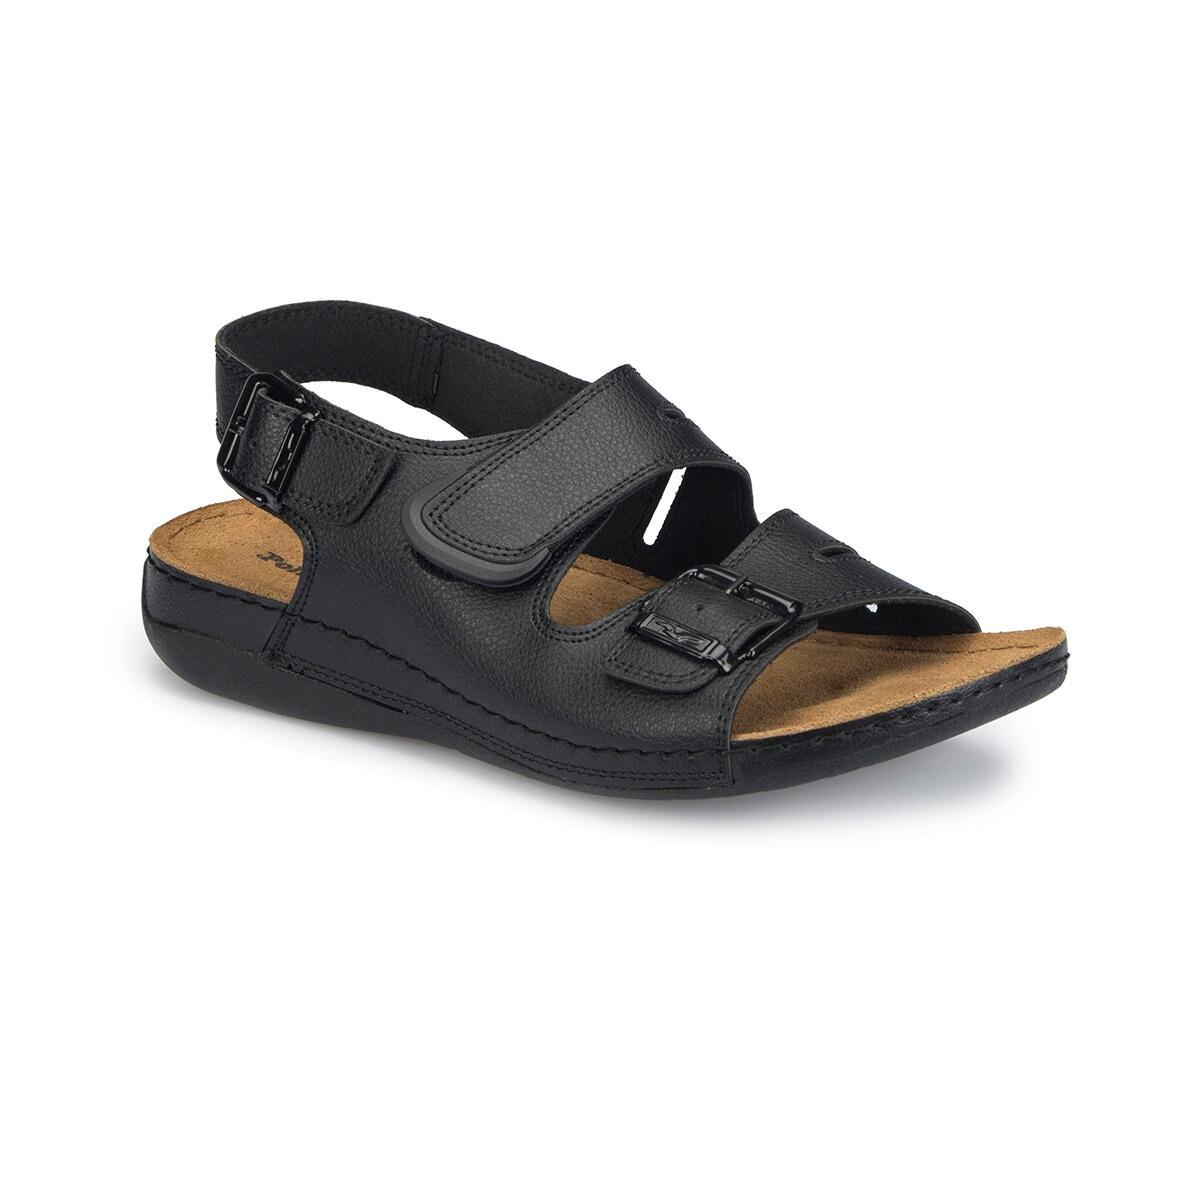 FLO 81. 157731.M Black Men 'S Classic Shoes Polaris